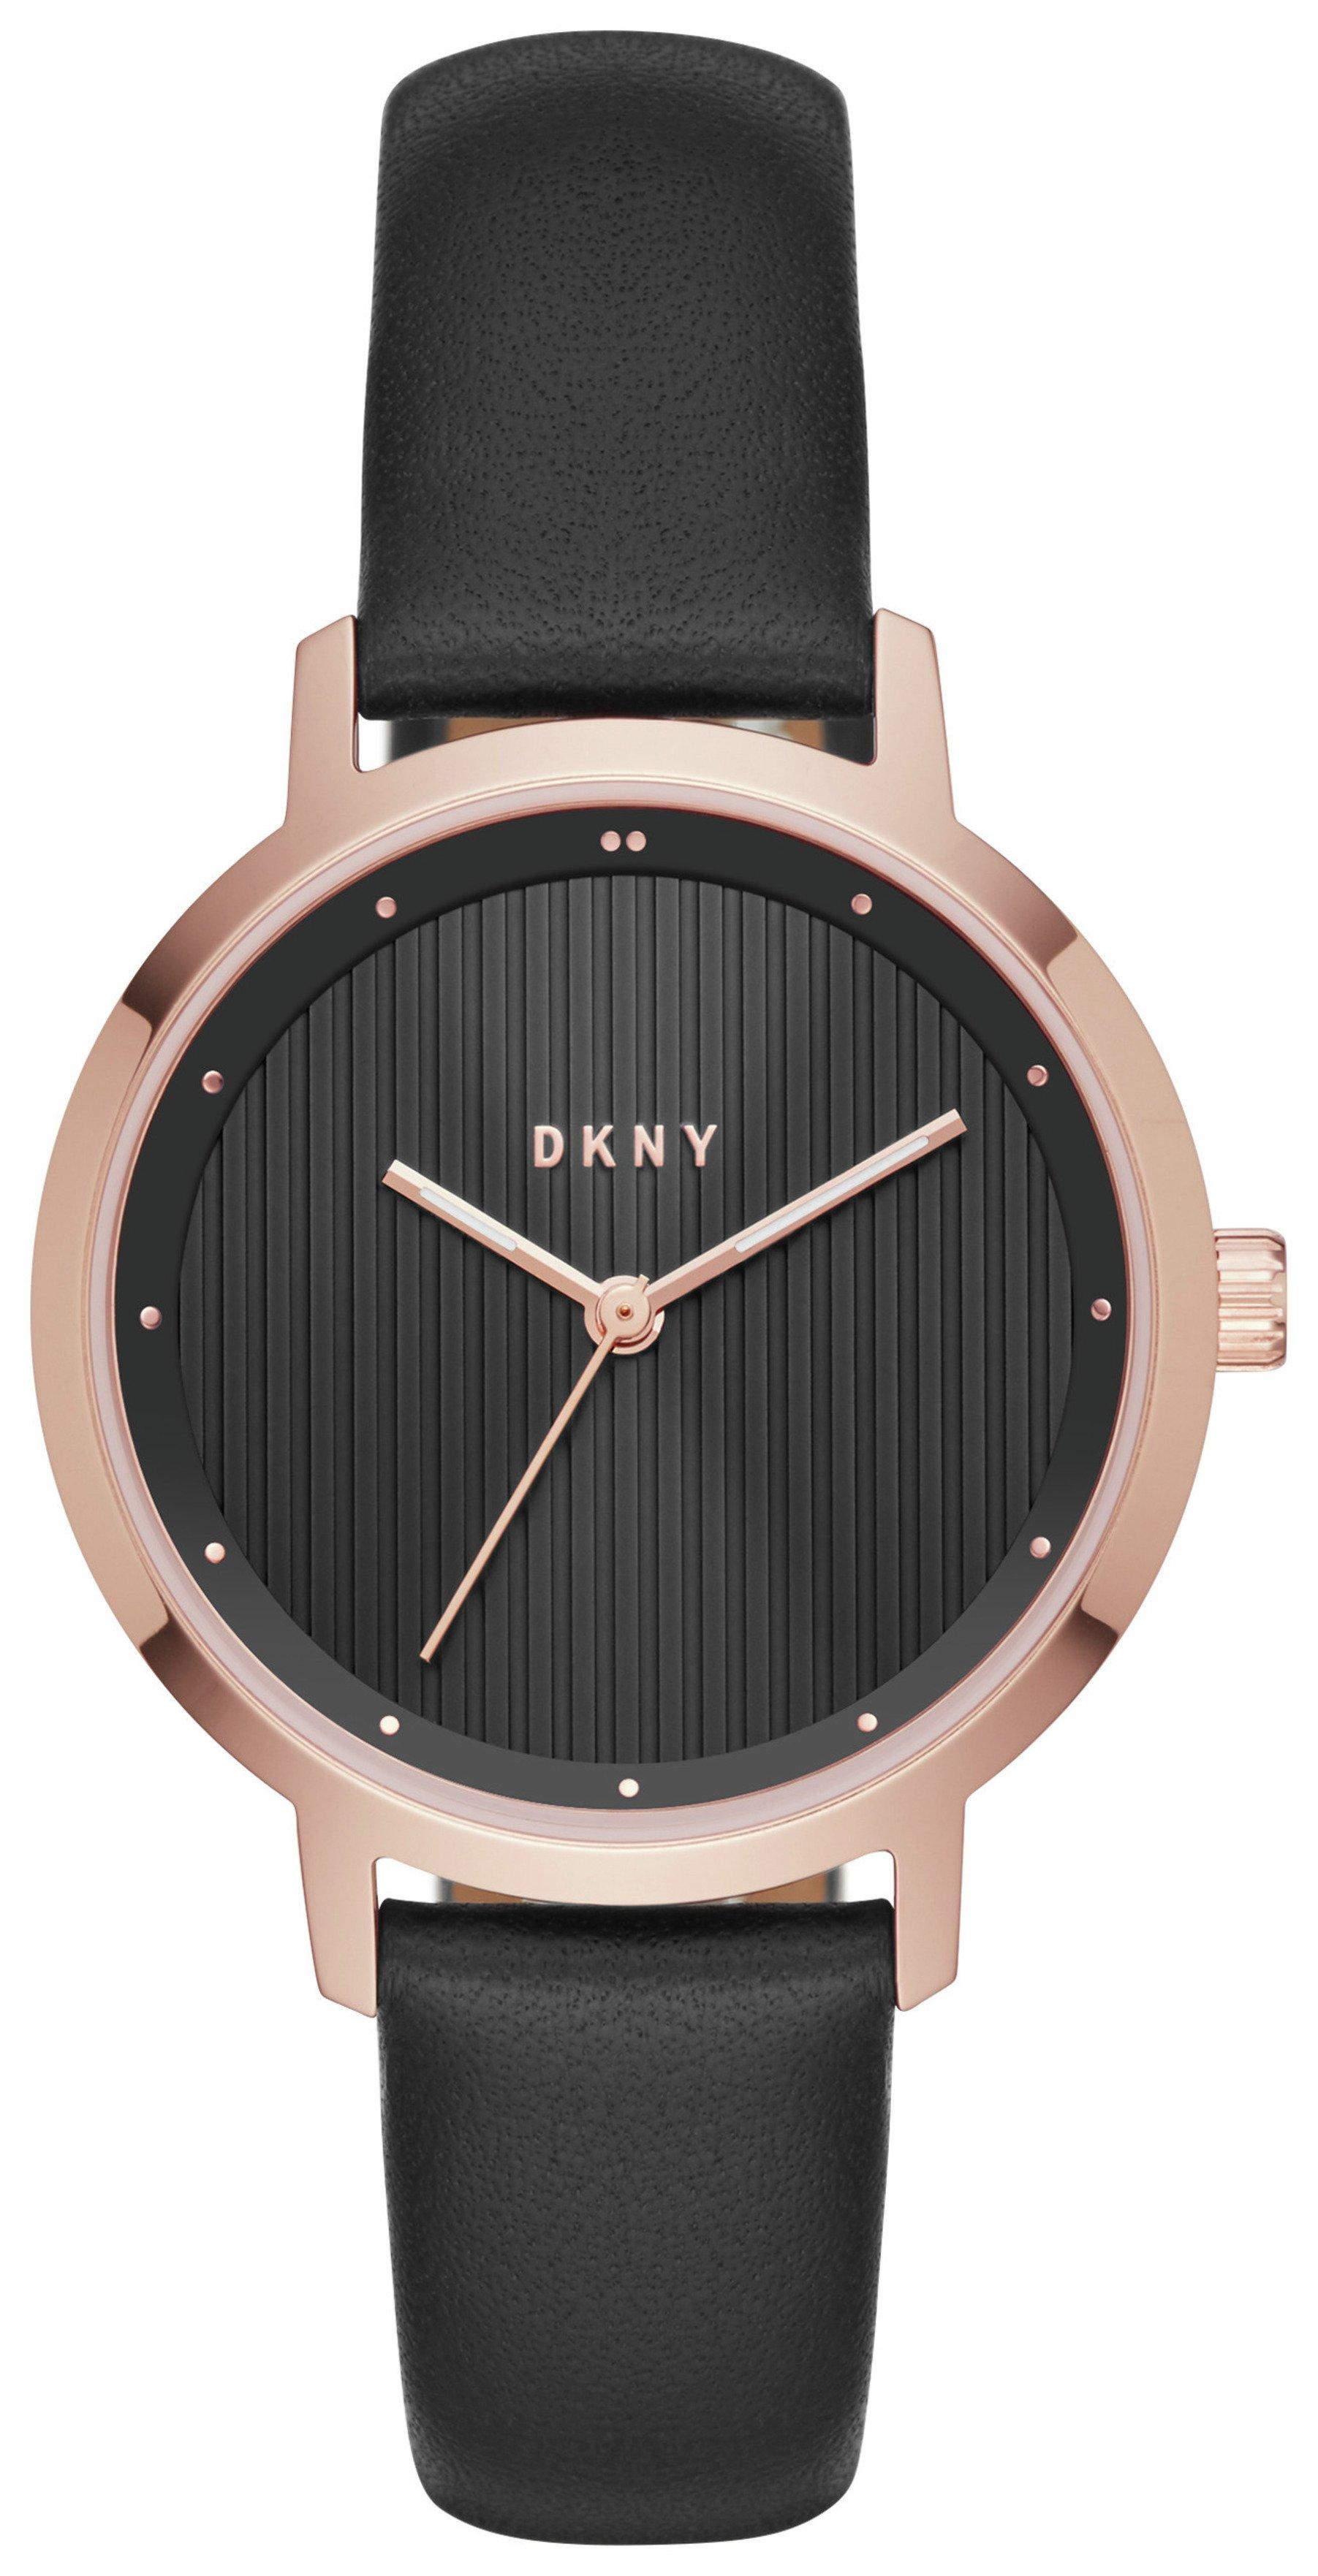 Strap Watch Black Dkny Ladies' The Modernist Ny2641 0nkwO8PX